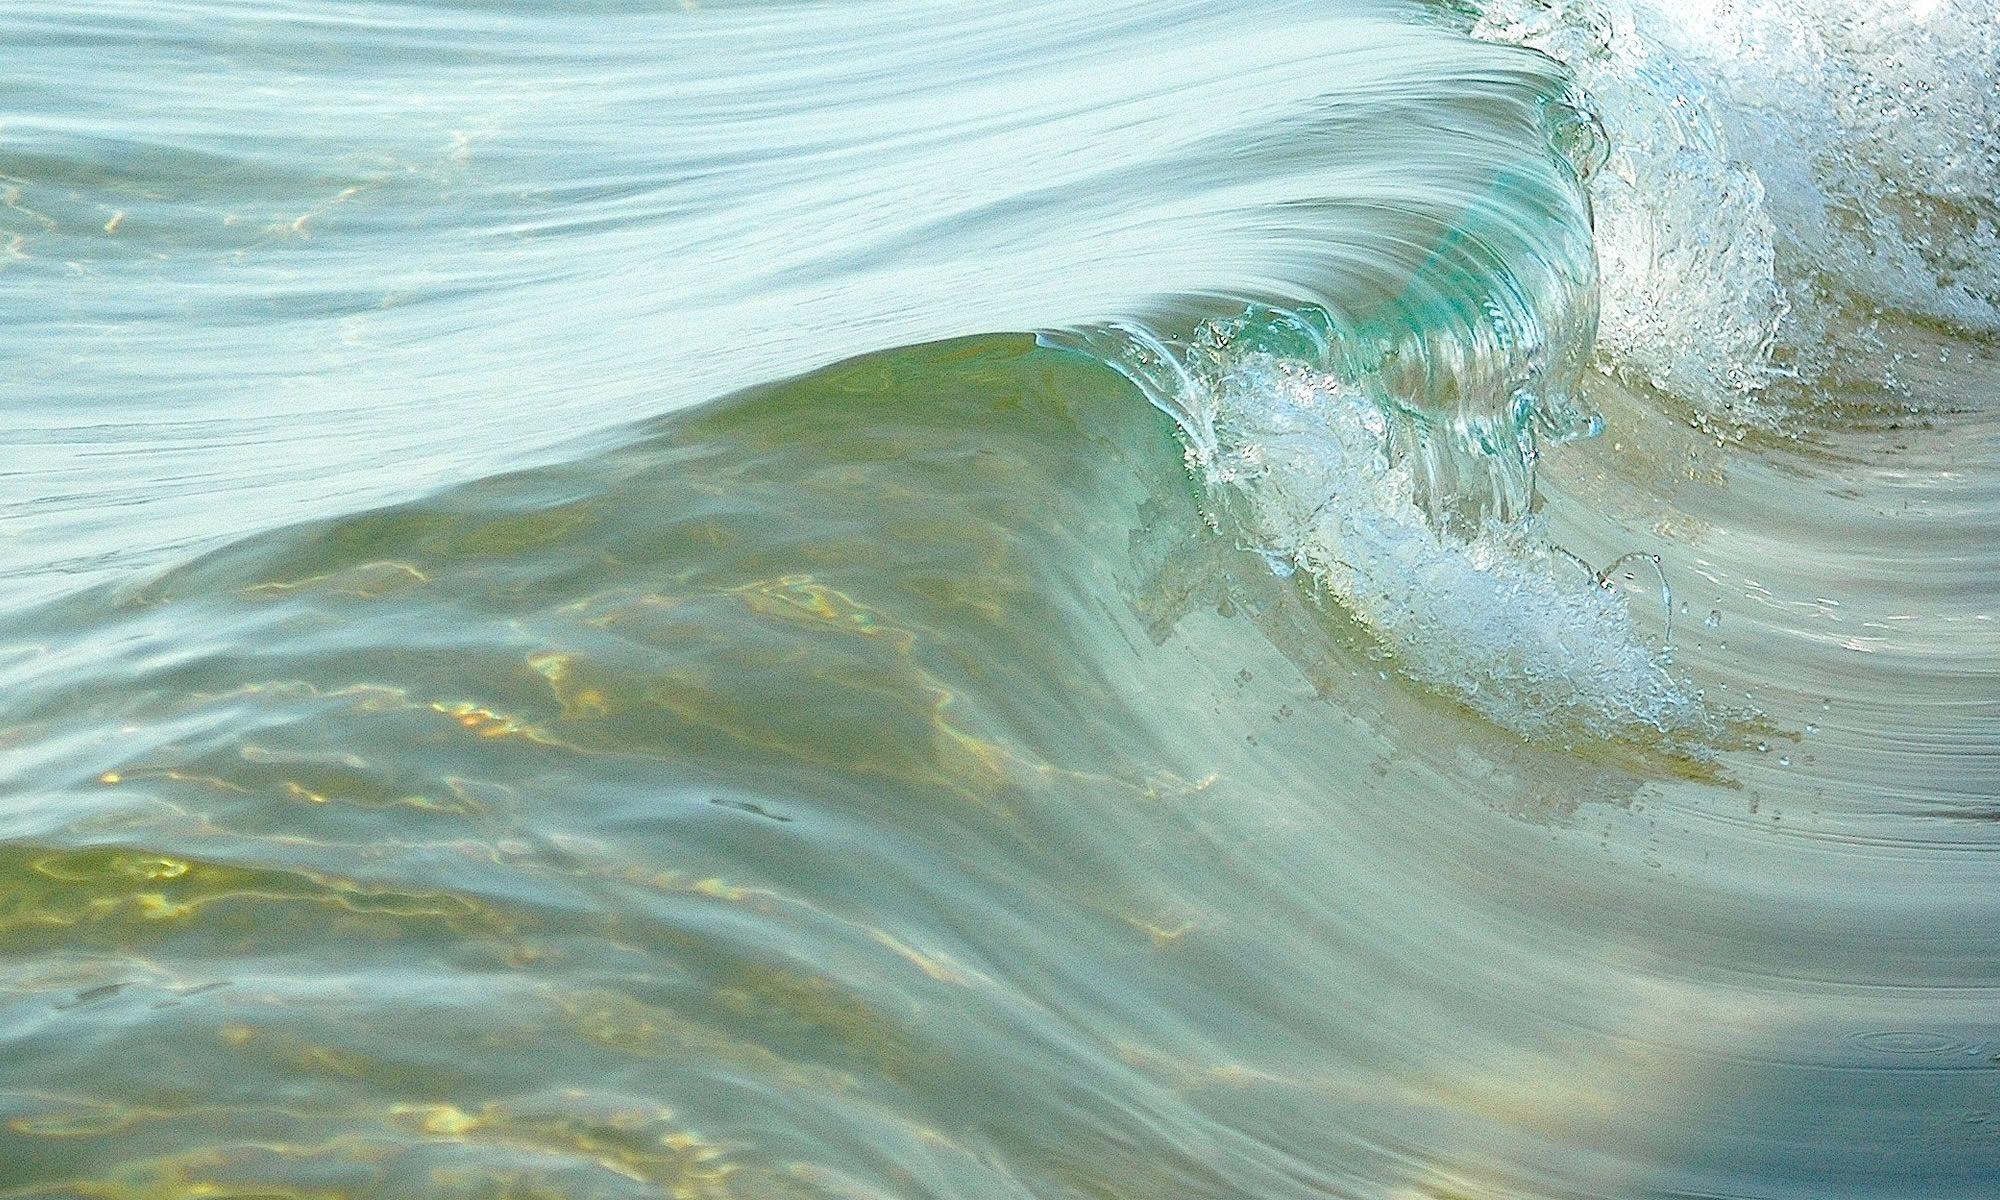 energiearbeit-meereswelle-christine-hagn-muenchen-wessling-landsberg